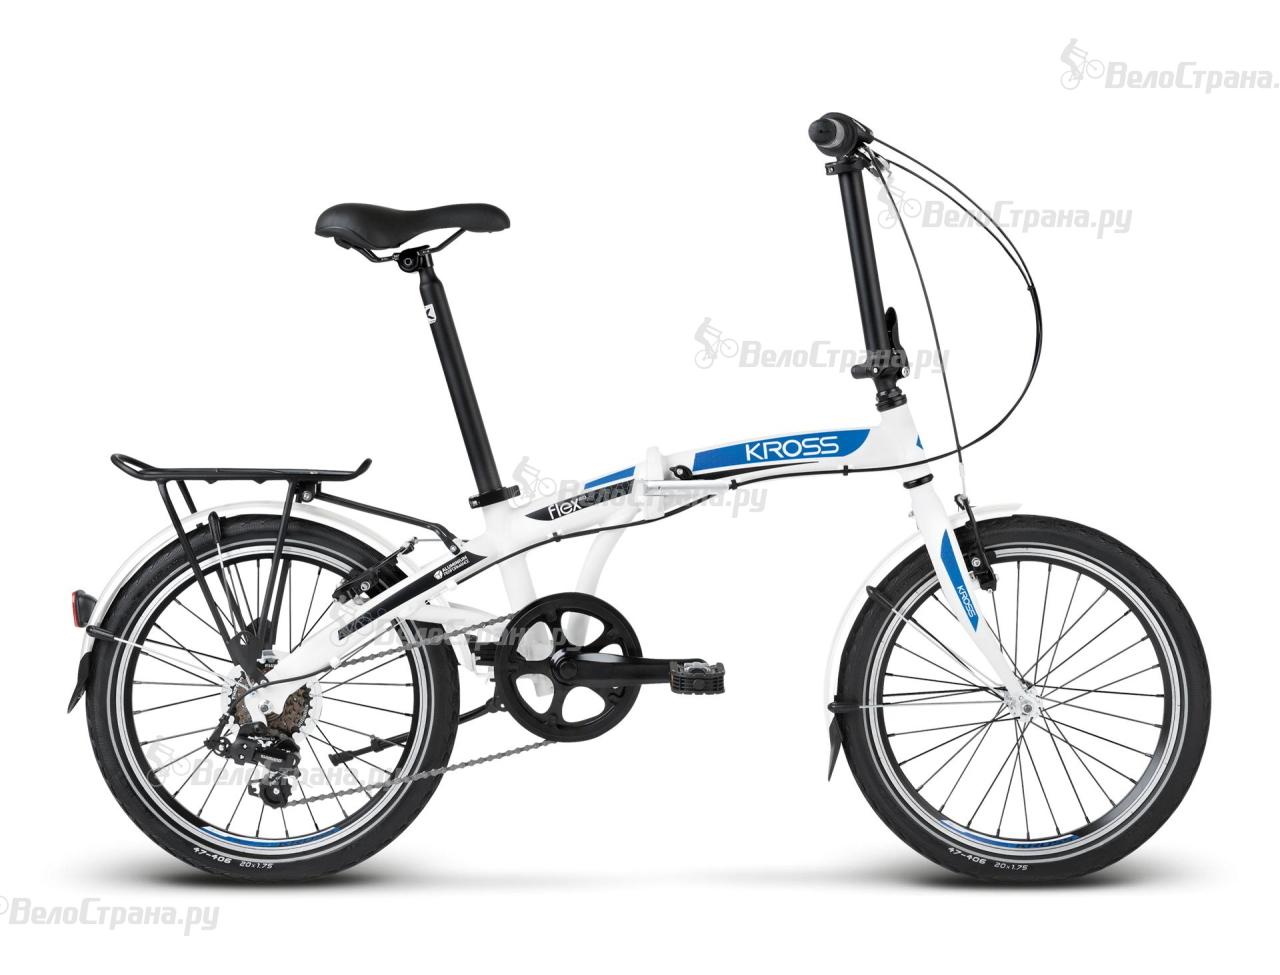 Велосипед Kross Flex 2.0 (2017) велосипед kross flex 2 0 2015